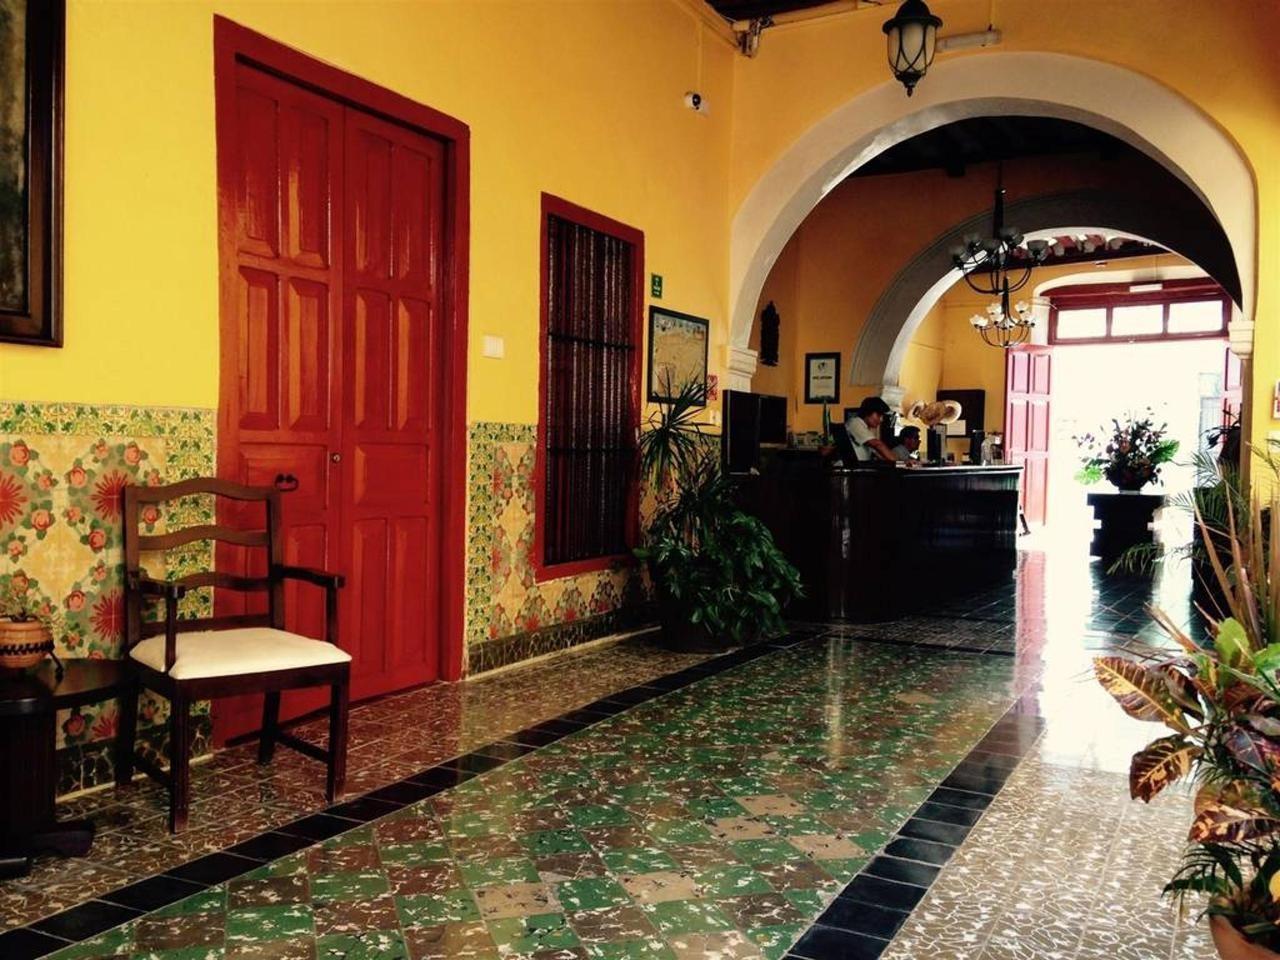 Reception at Hotel Castelmar Campeche